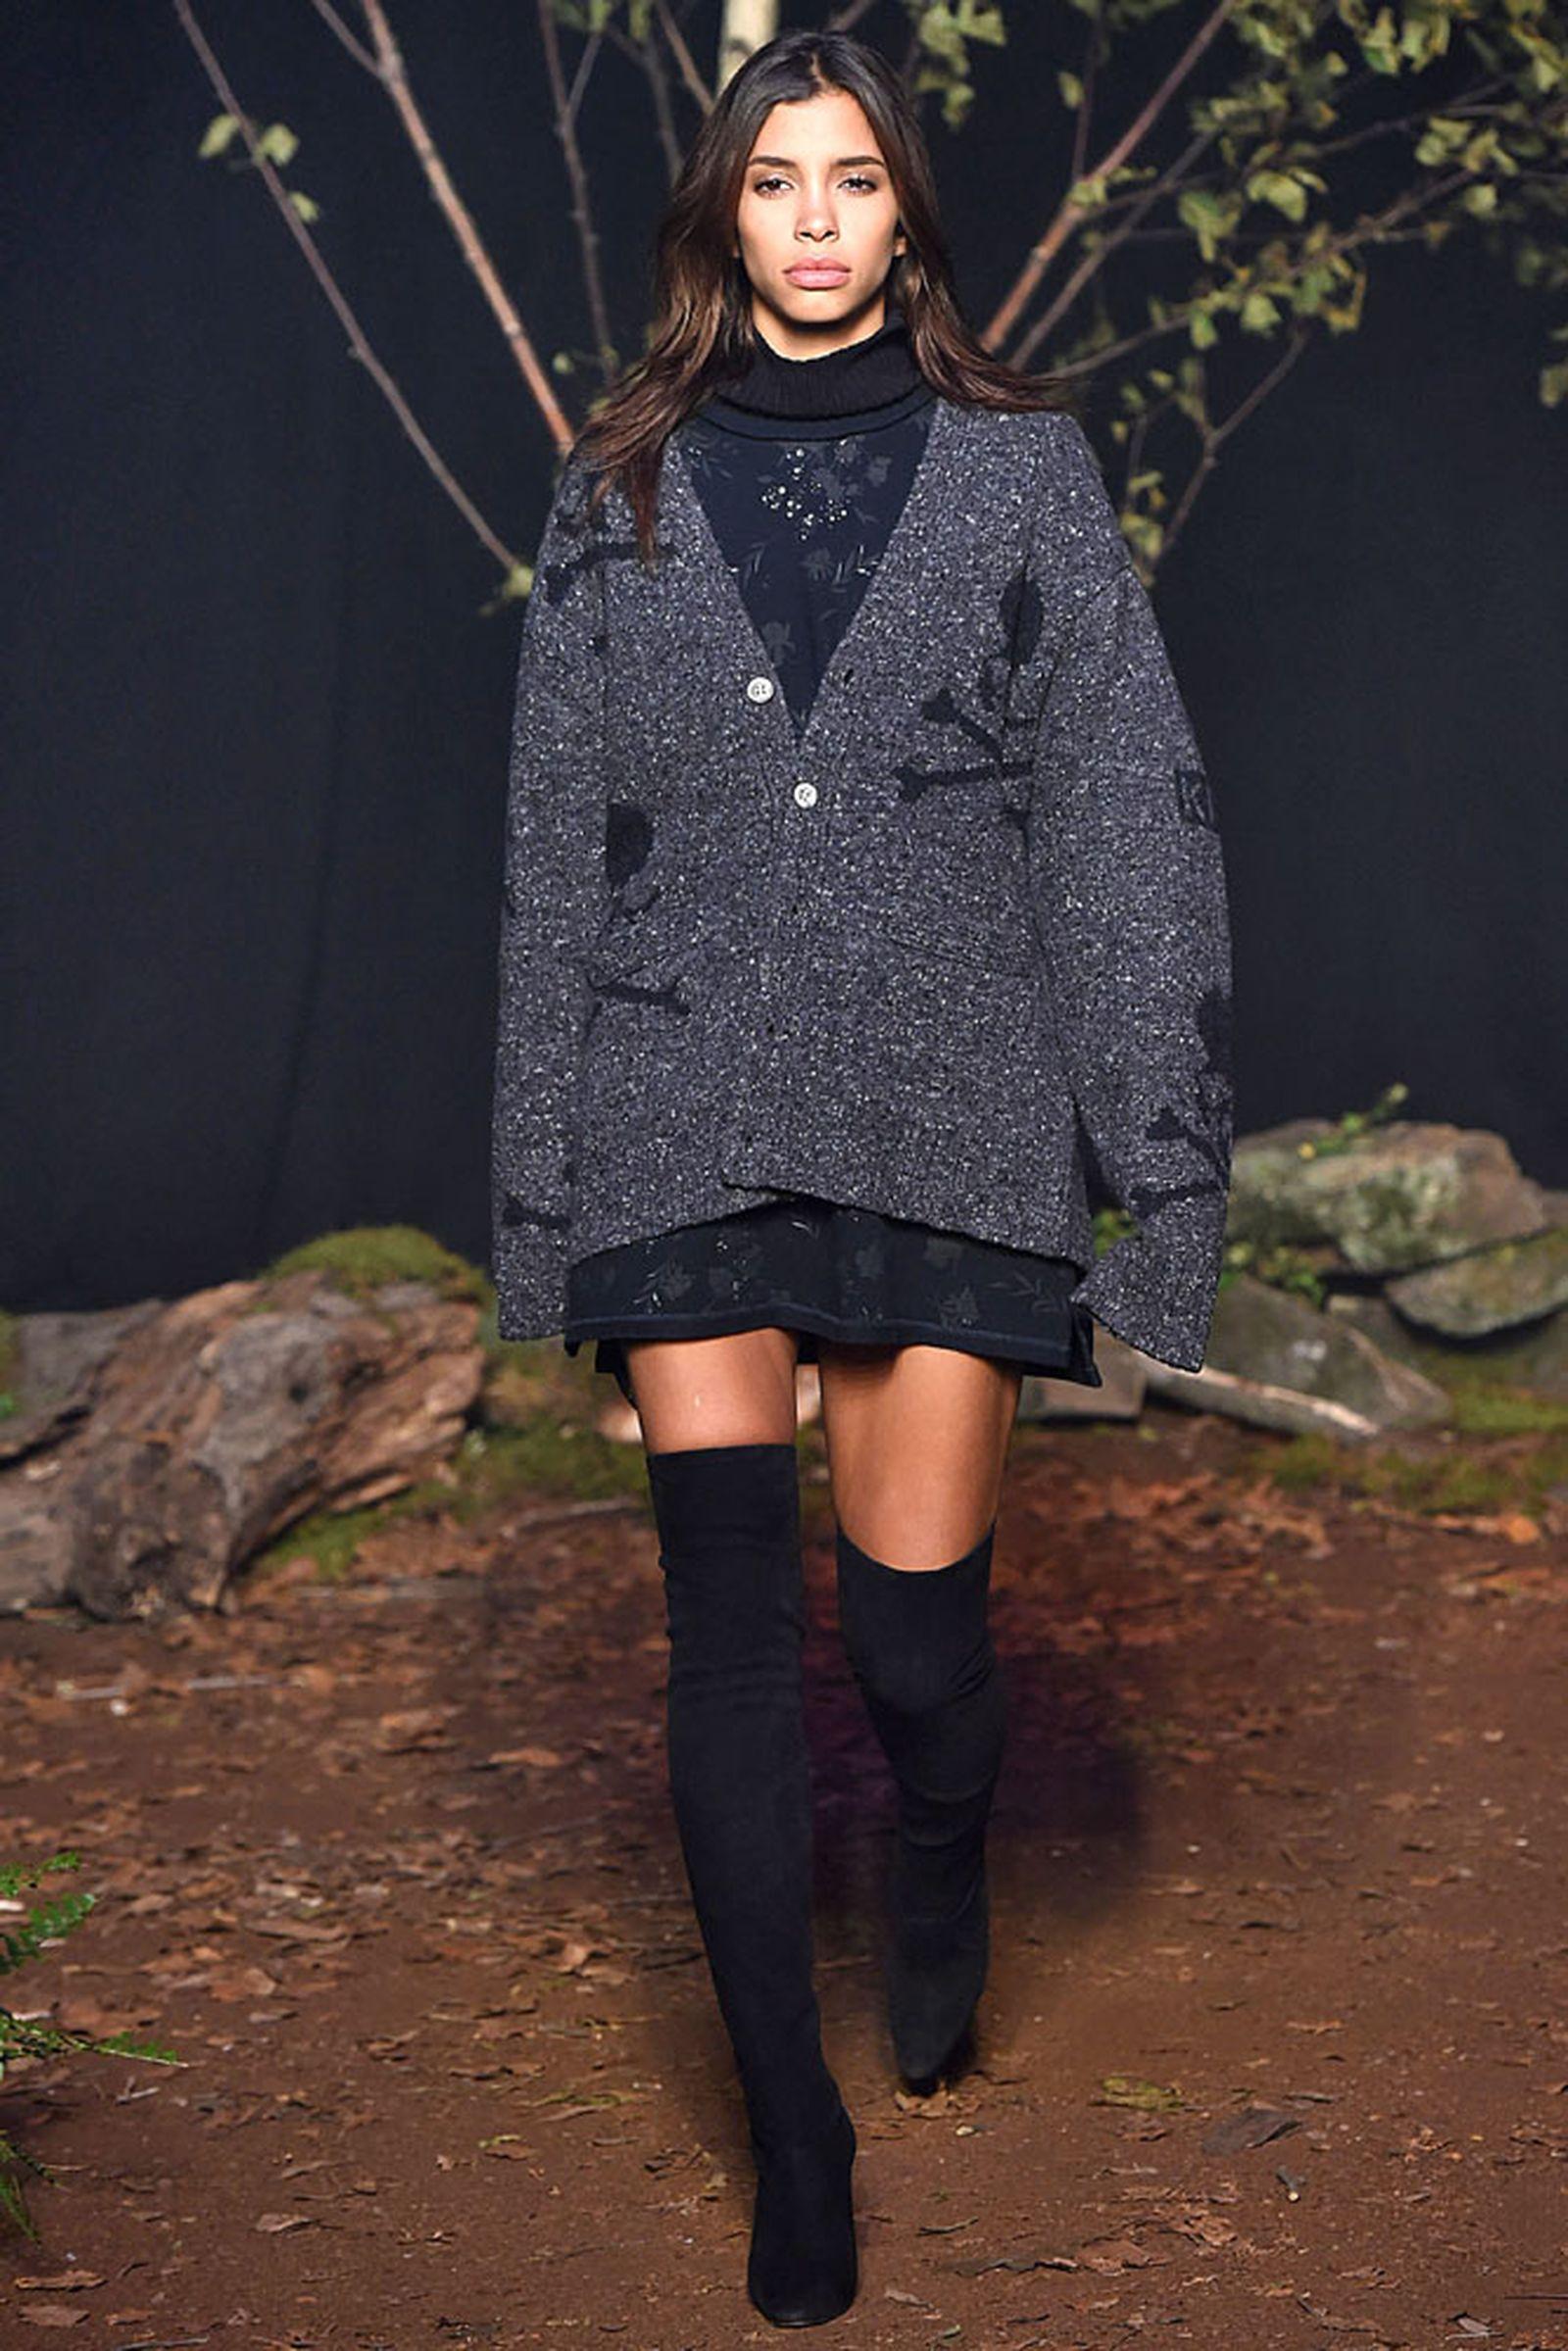 Kith New York Fashion Week Spring Summer 2019 NY September 2019 fashion shows greg lauren kith park